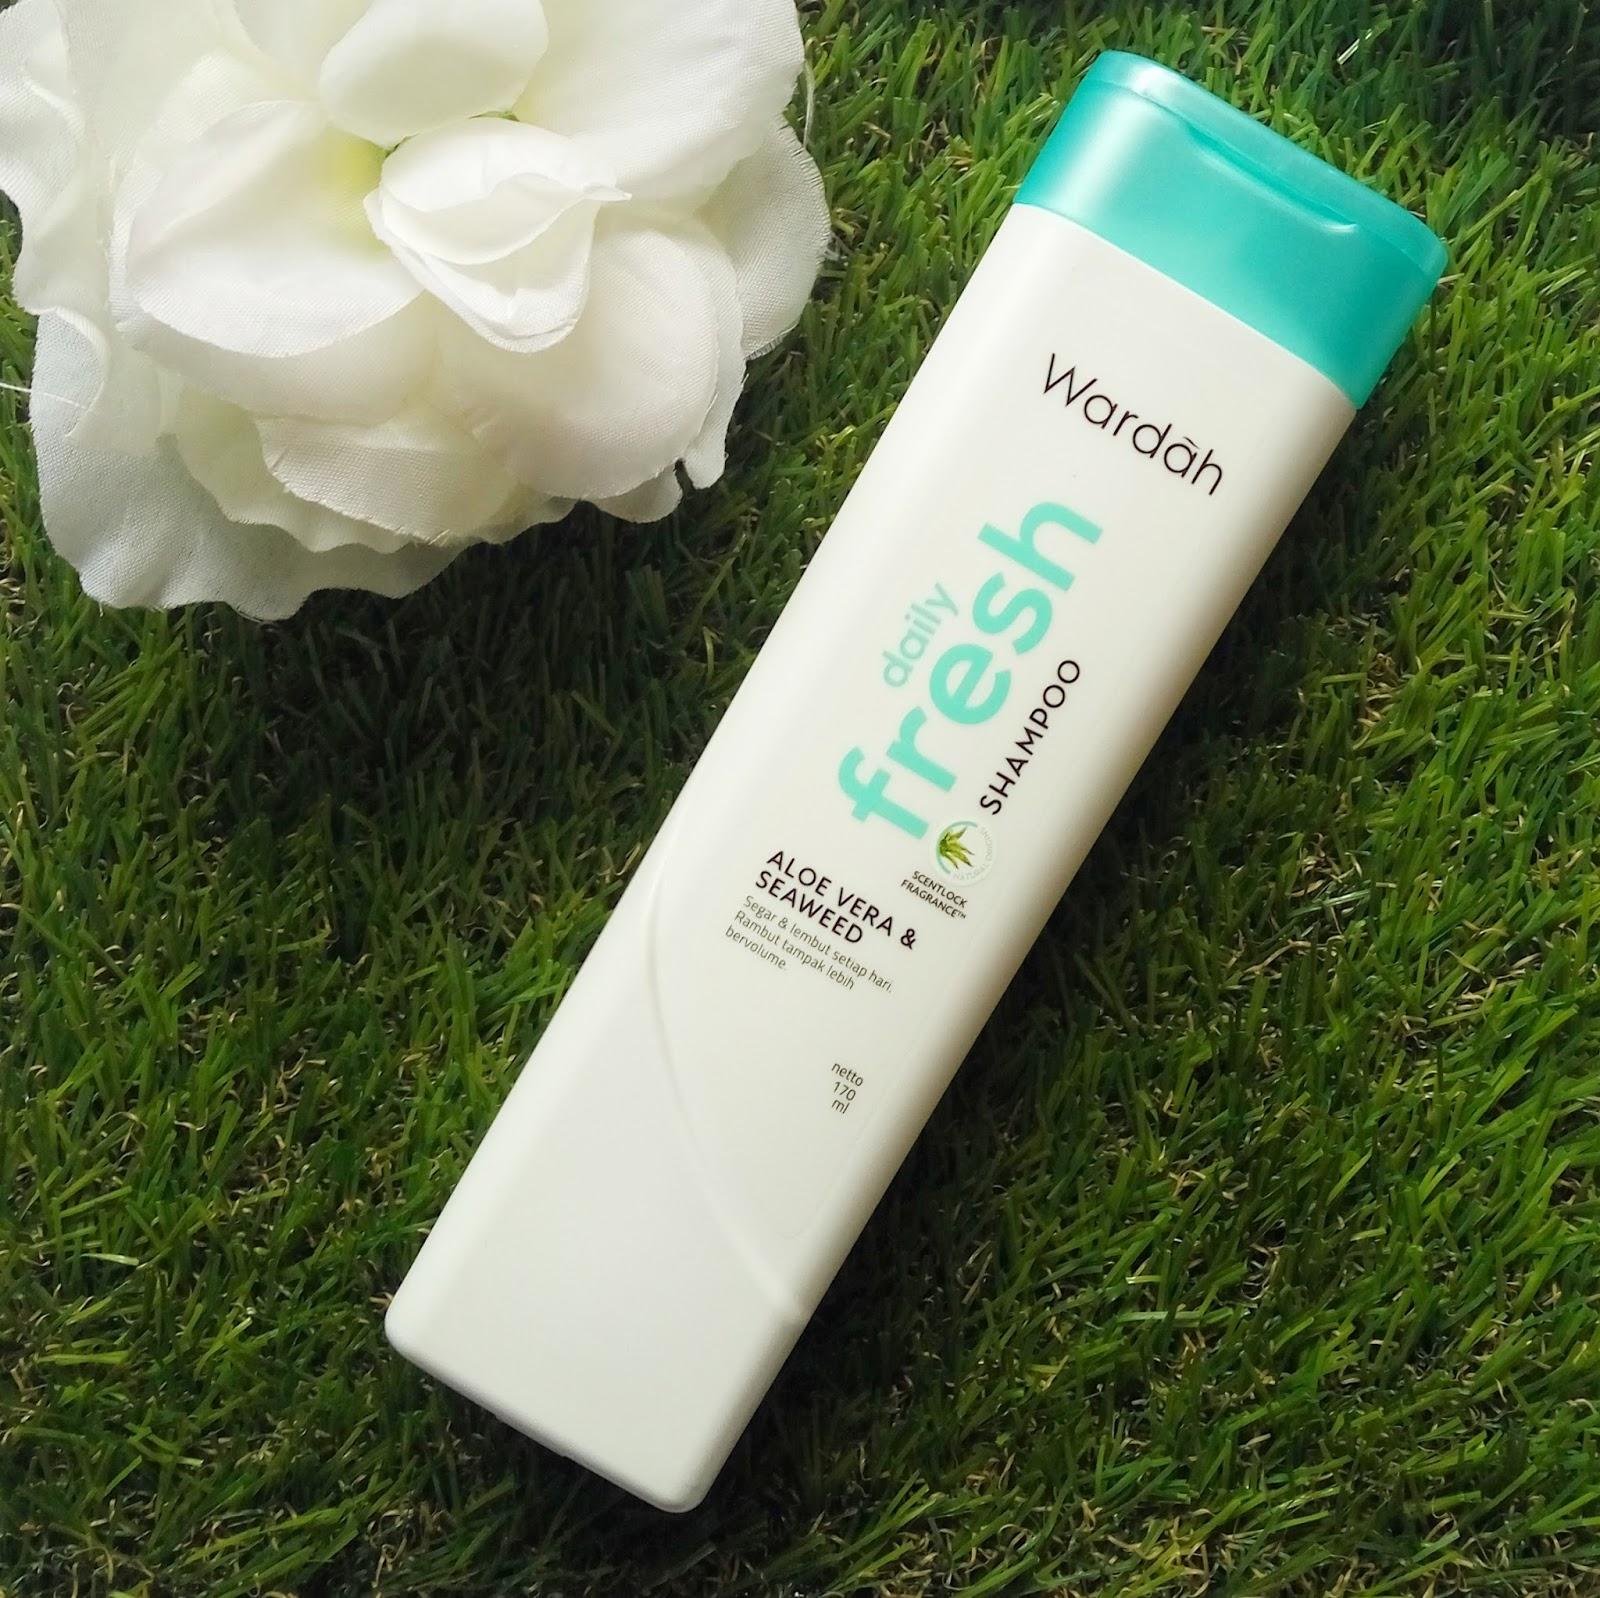 Review Wardah Shampoo All Varian Daretochange By Indonesian Beauty Nutri Shine 170 Ml Daily Fresh